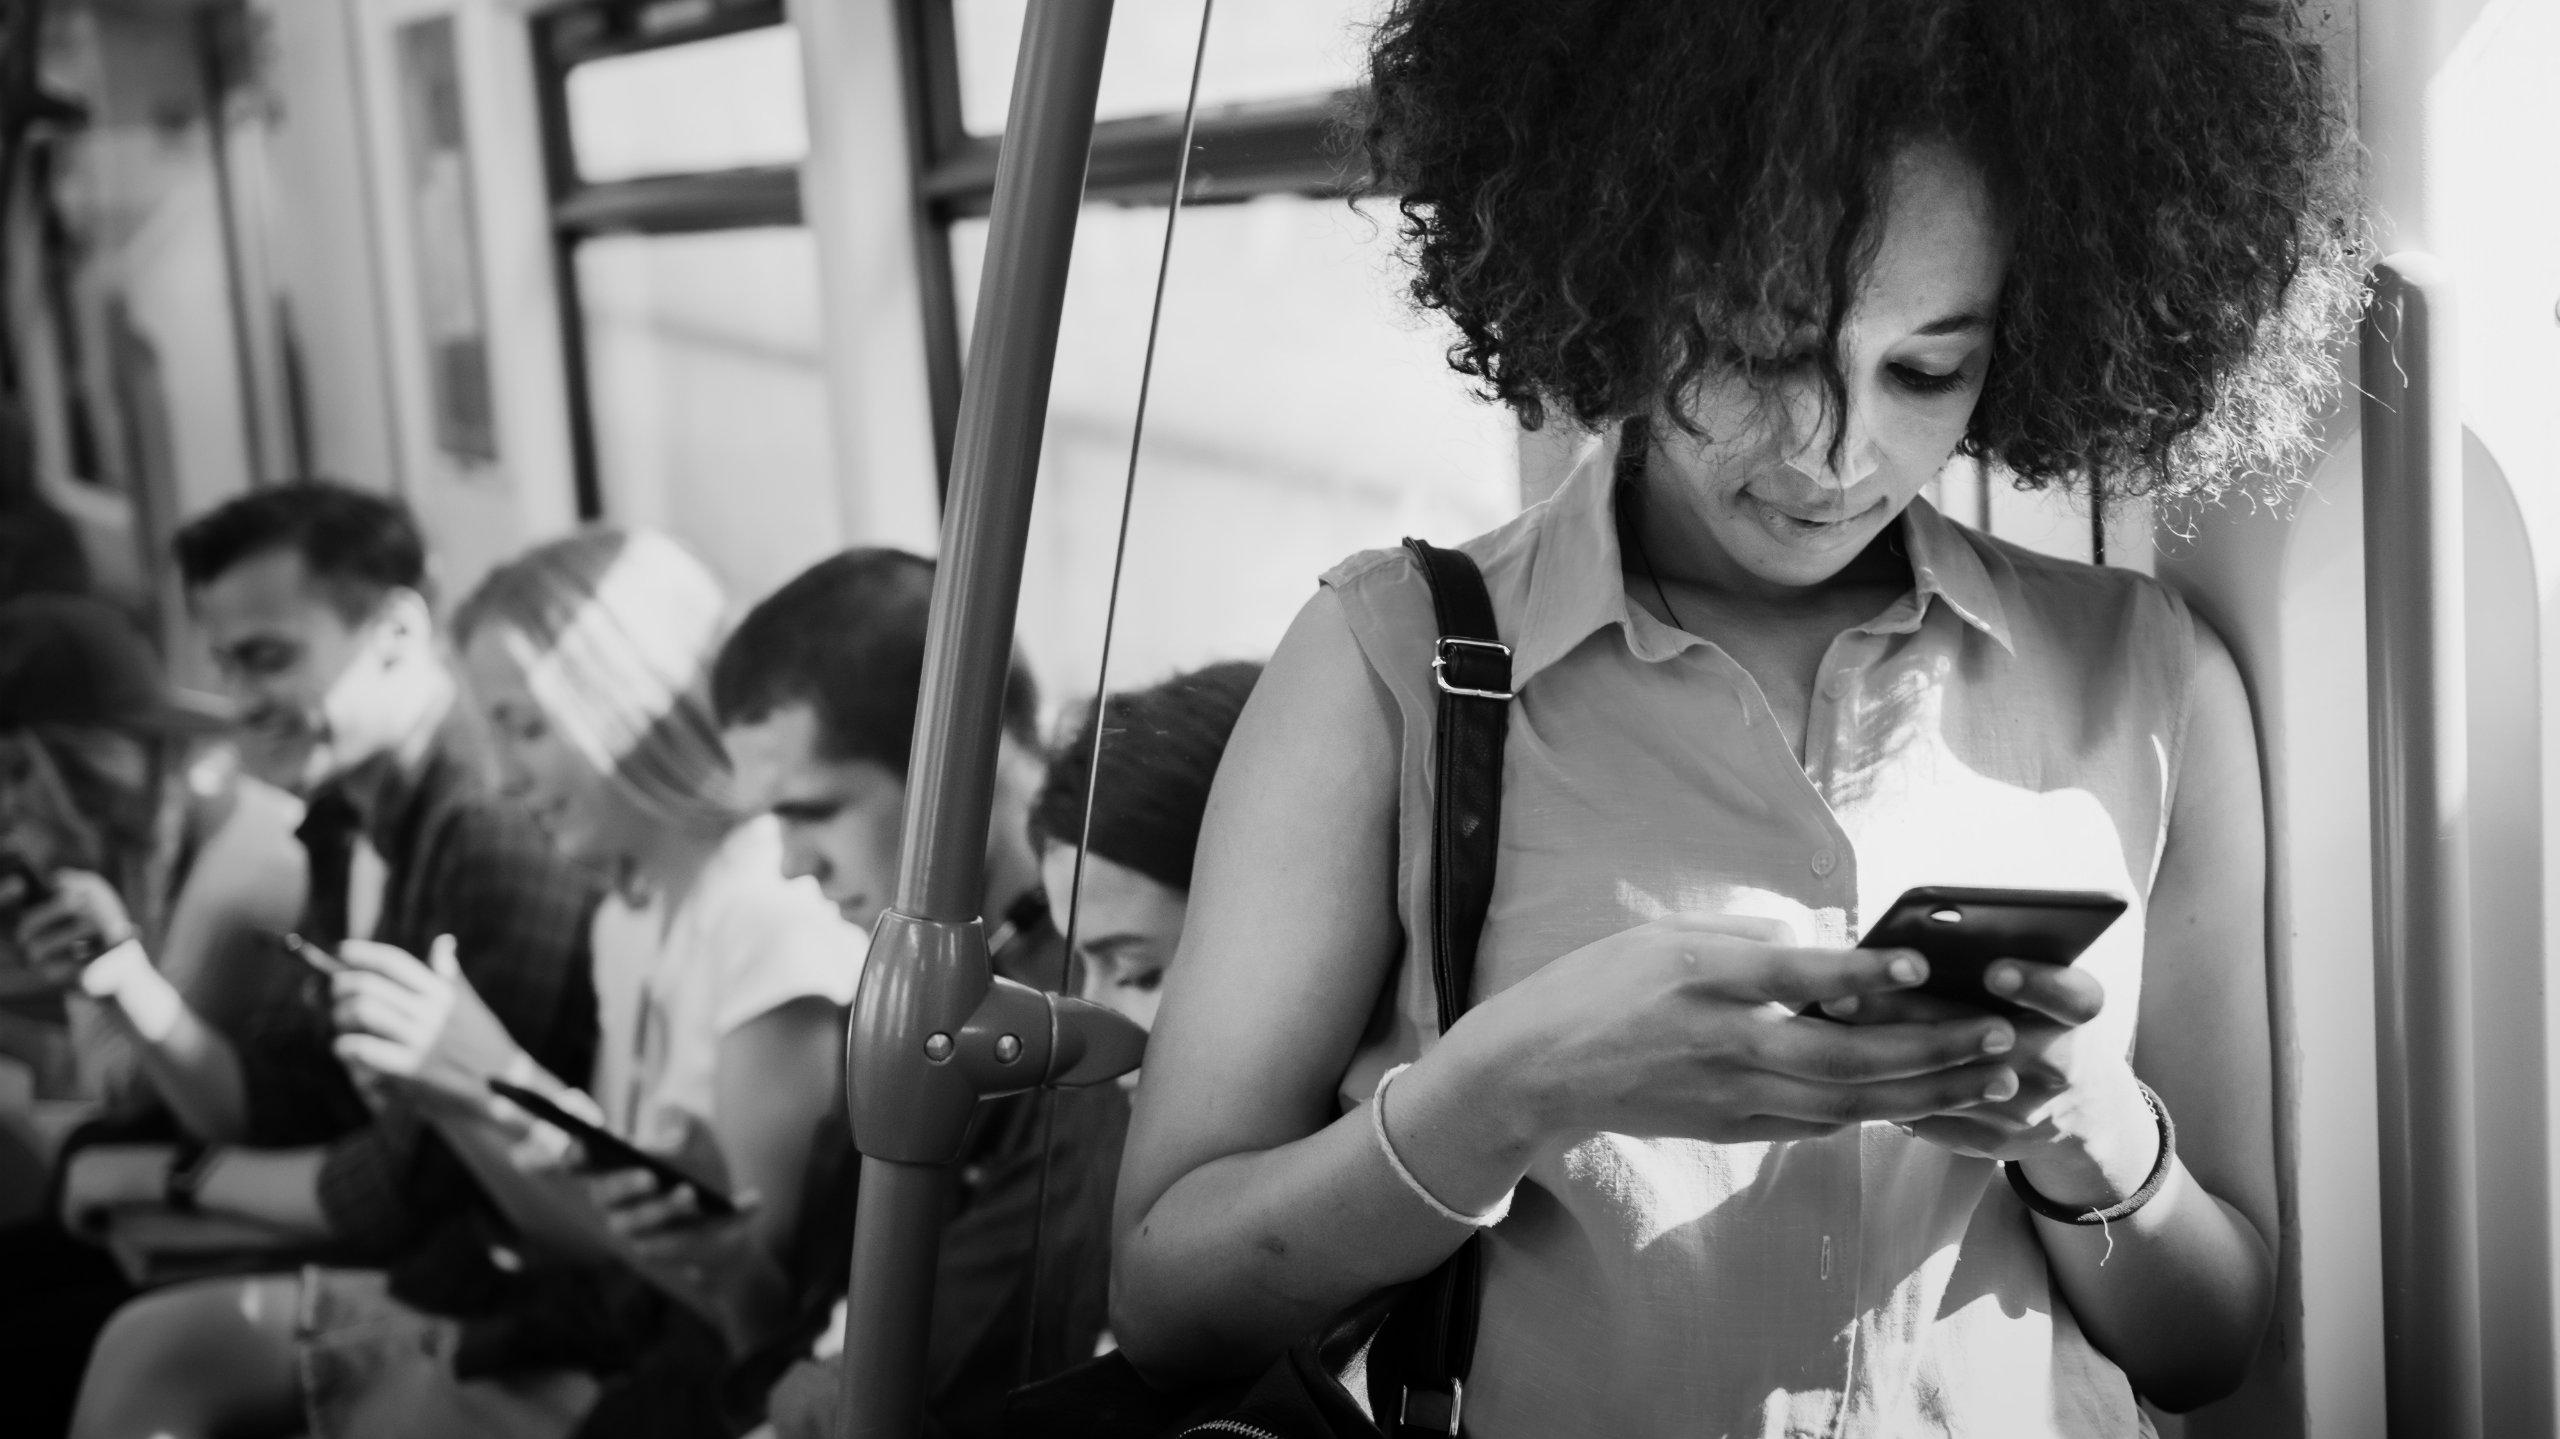 train passengers using smartphones